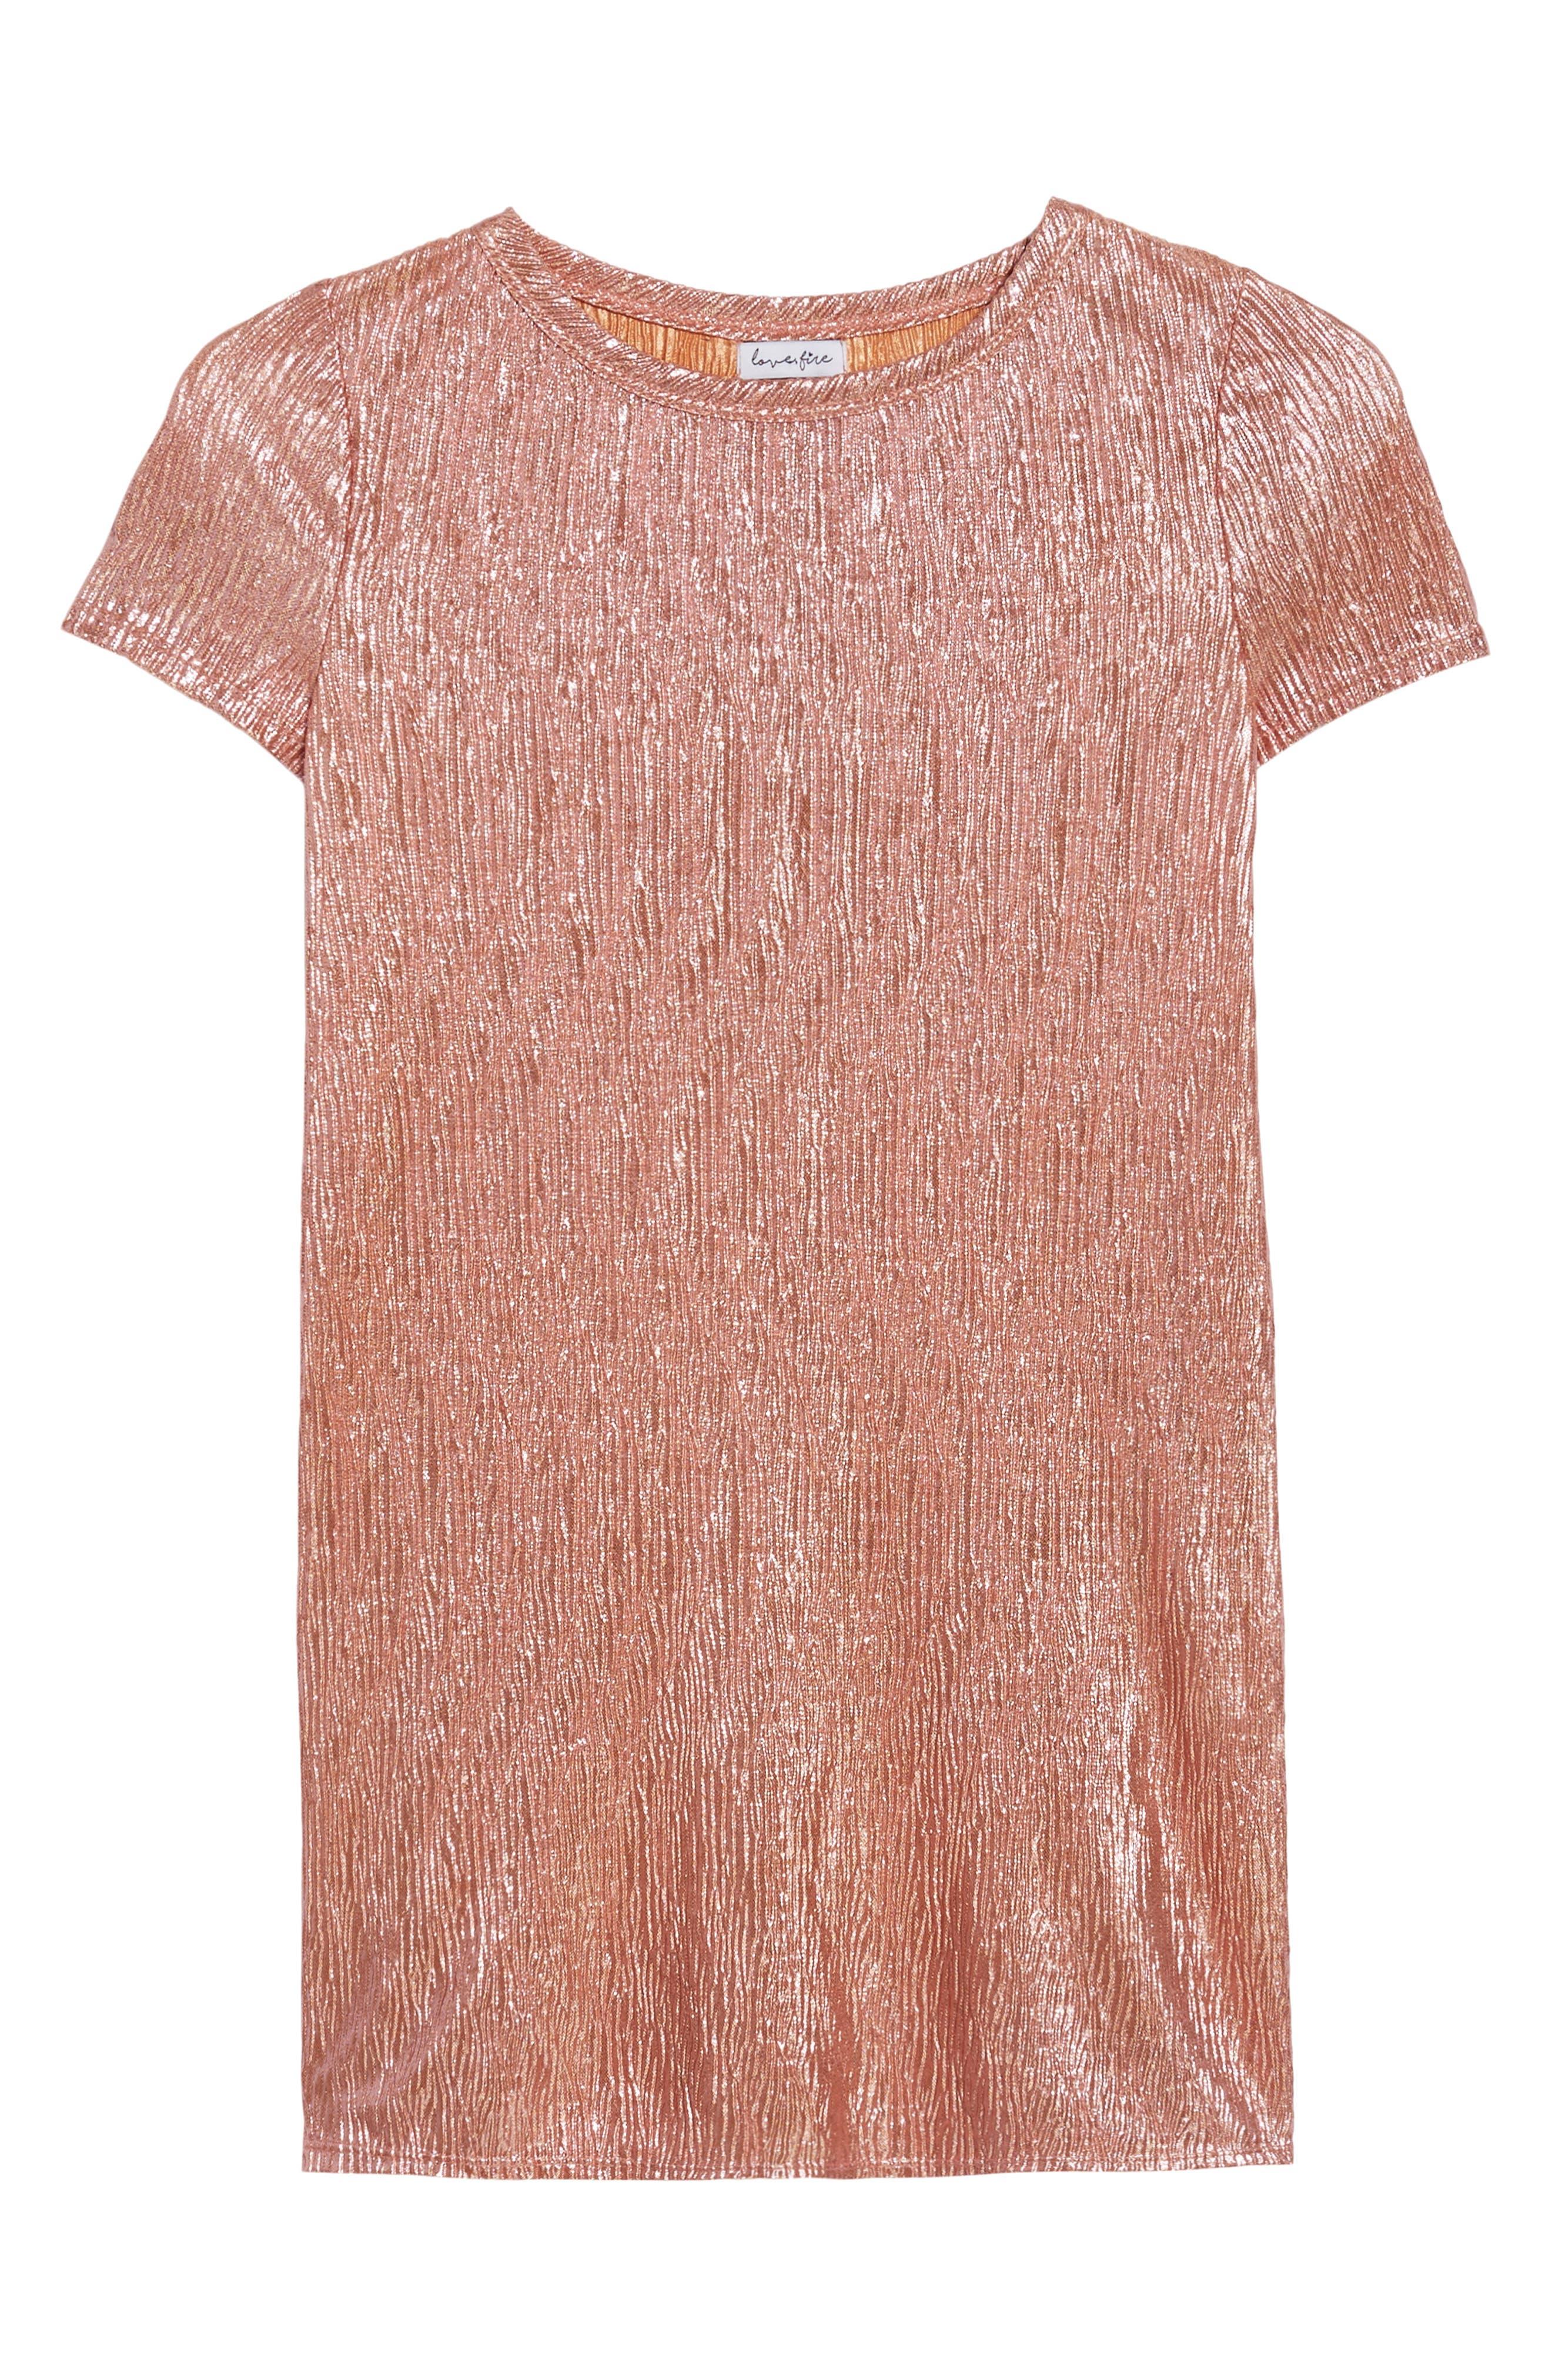 Love Fire Crinkled Metallic T-Shirt Dress,                             Main thumbnail 1, color,                             681